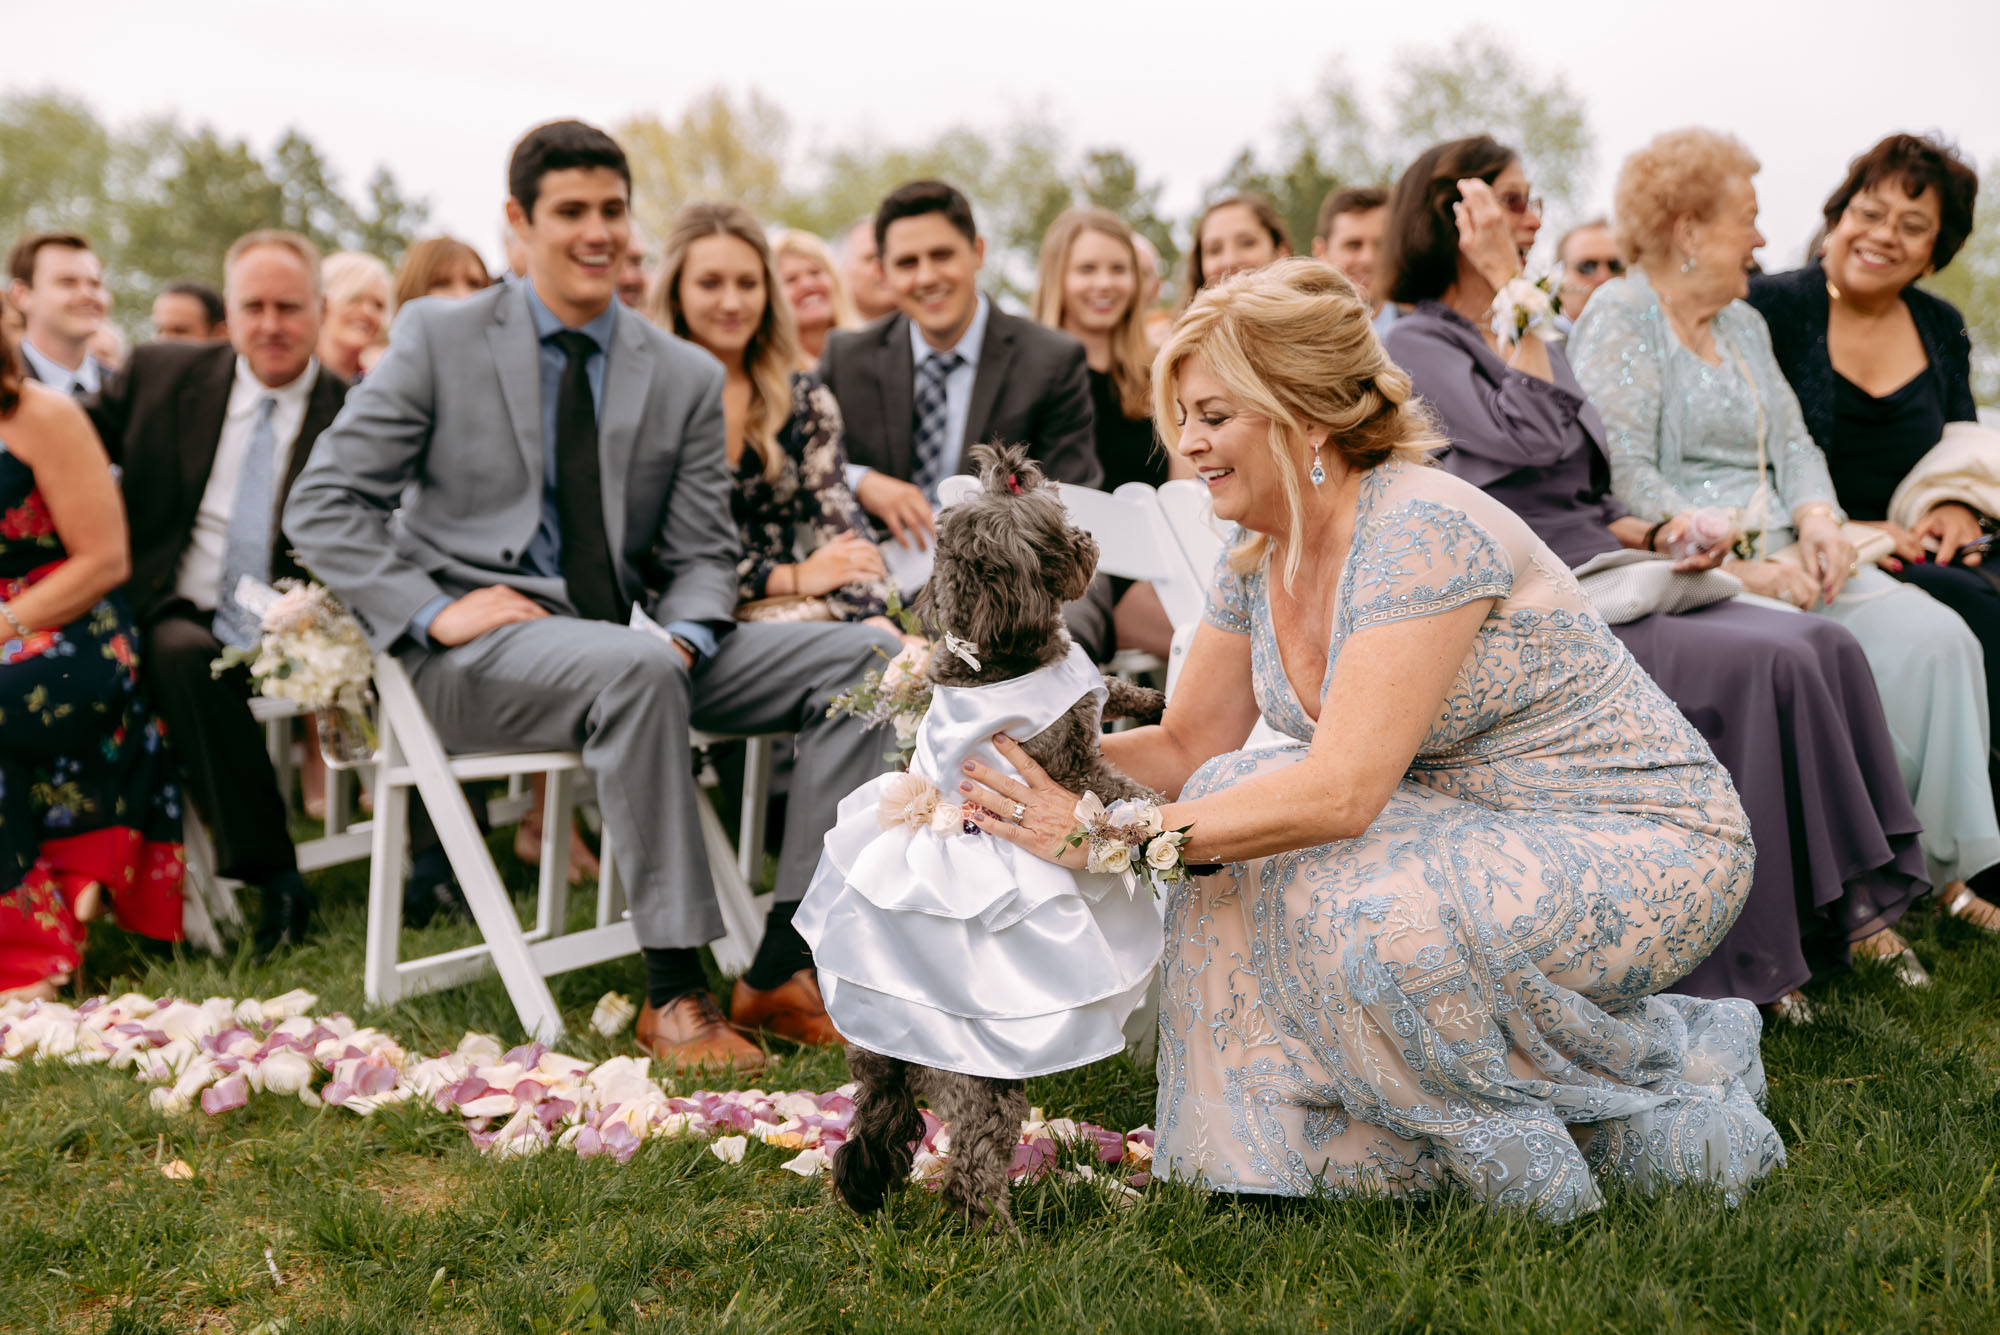 orchard-farms-pavillion-wedding-rockton-IL-wedding-photographers-259.jpg